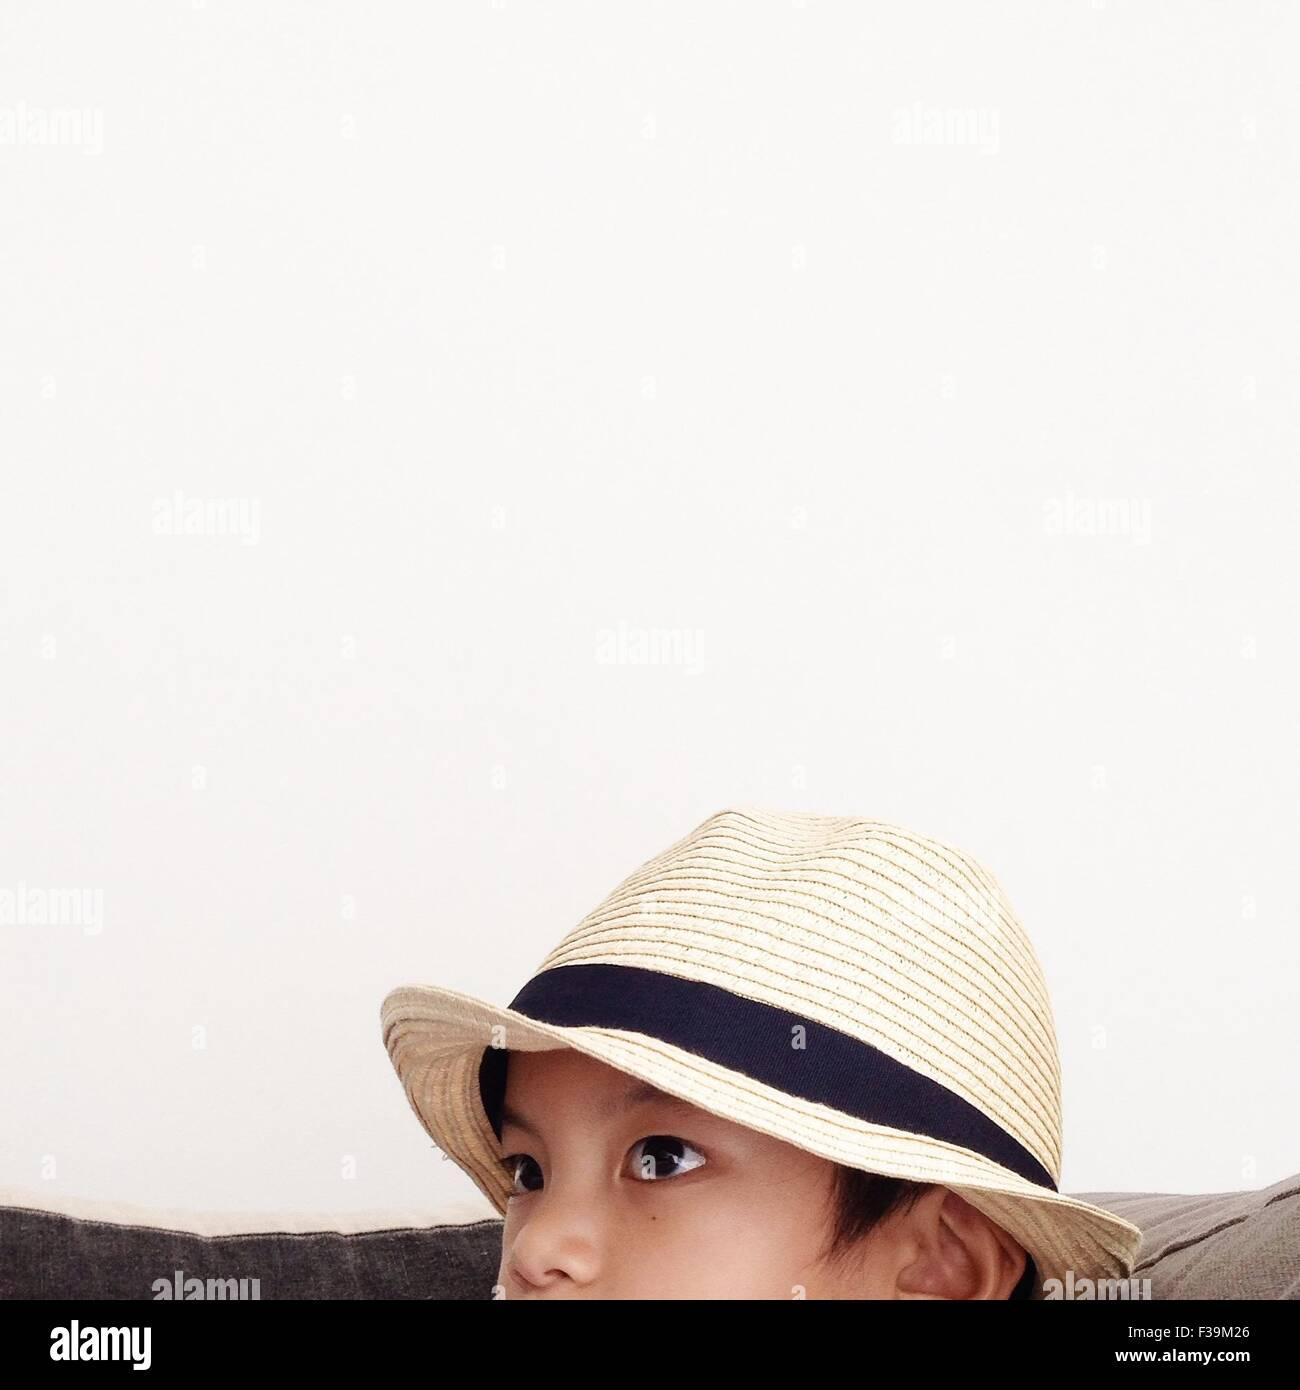 Retrato de un niño usando sombrero de paja Imagen De Stock